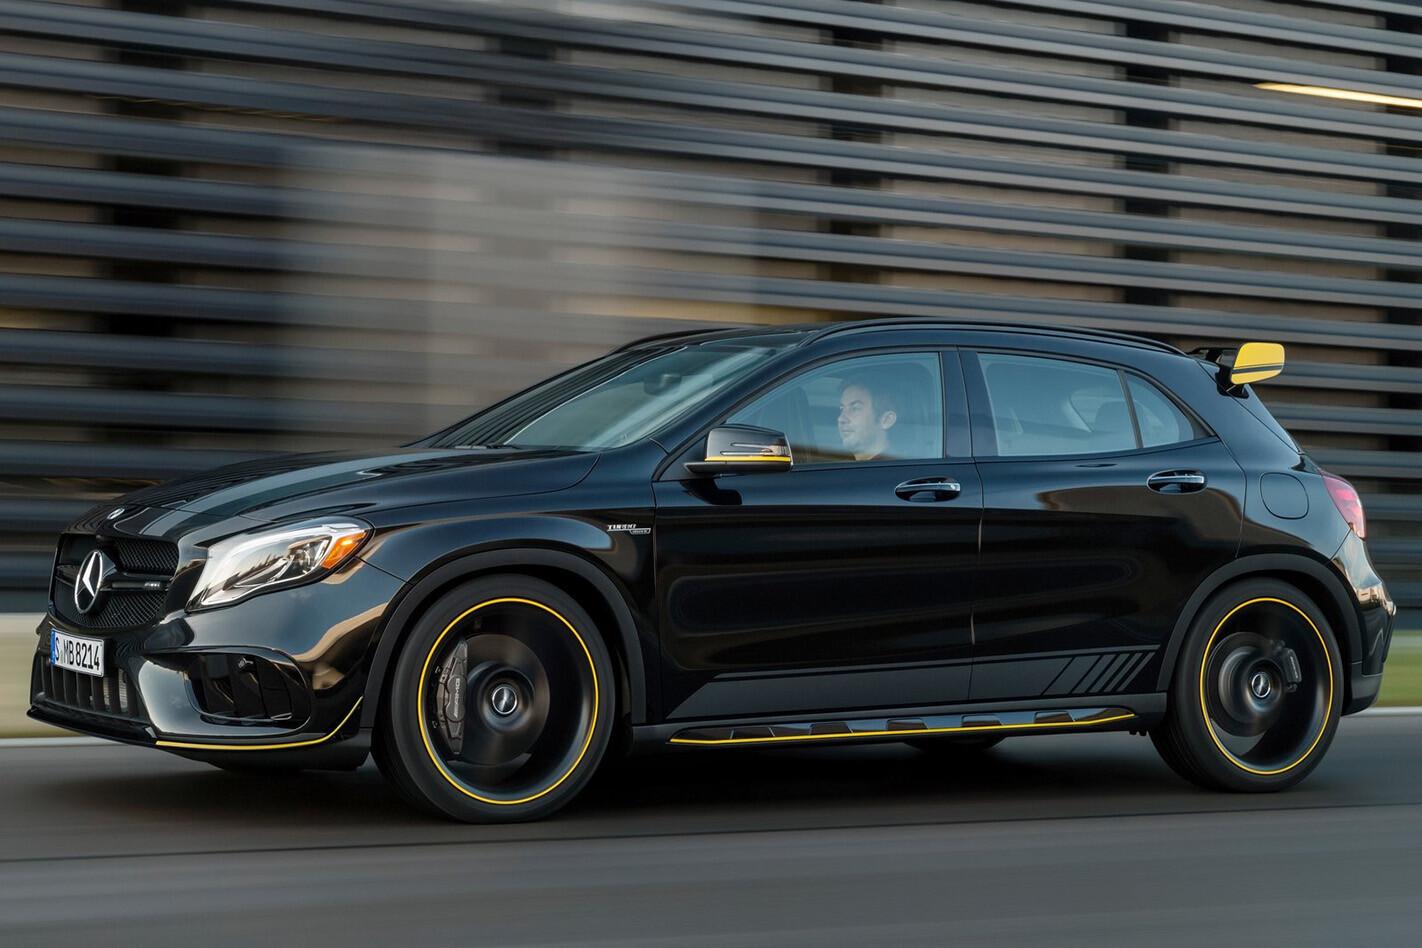 Mercedes Benz Gla 45 Amg 2018 1600 10 Jpg